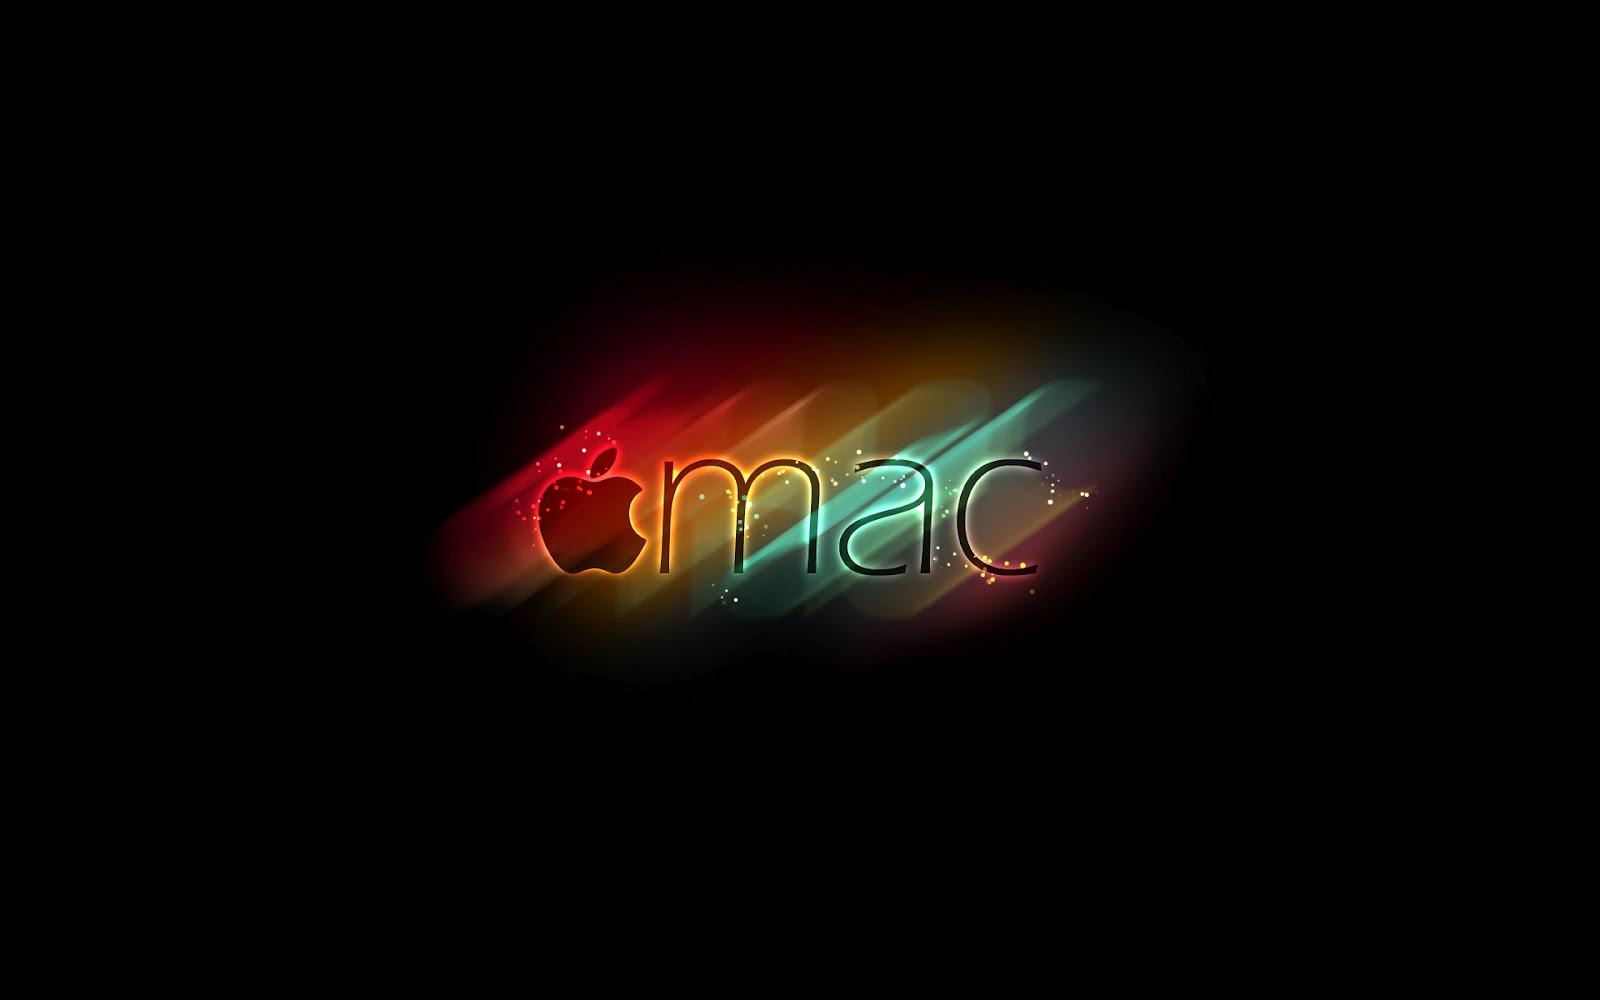 apple mac wallpaper hd apple mac wallpaper hd apple mac 1600x1000